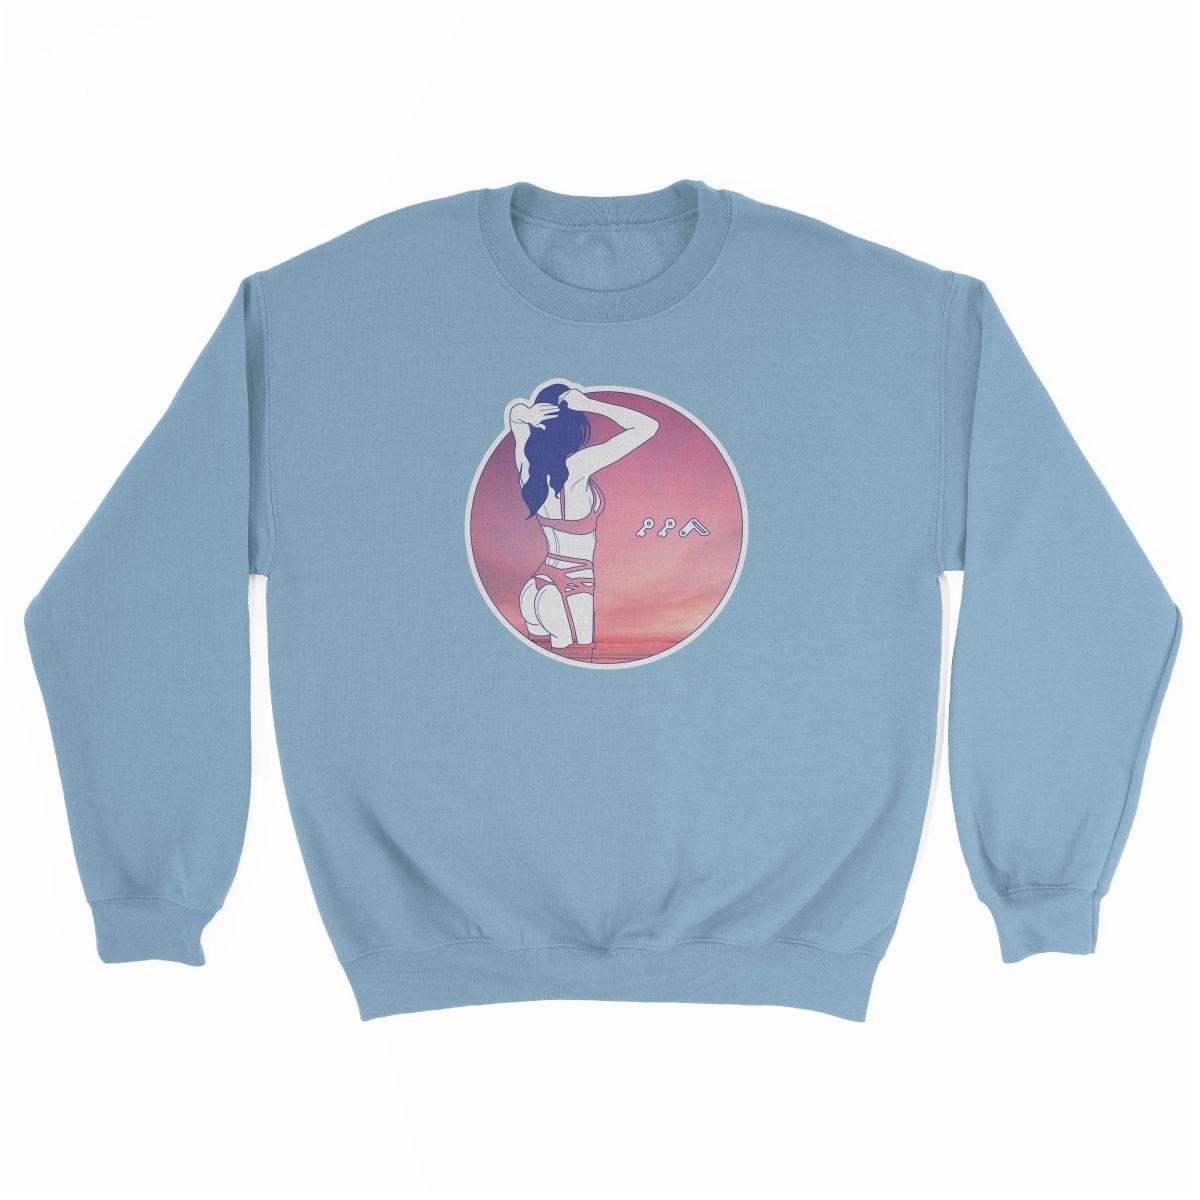 """NIGHT MOVES"" music festival beach sweatshirt in light blue"